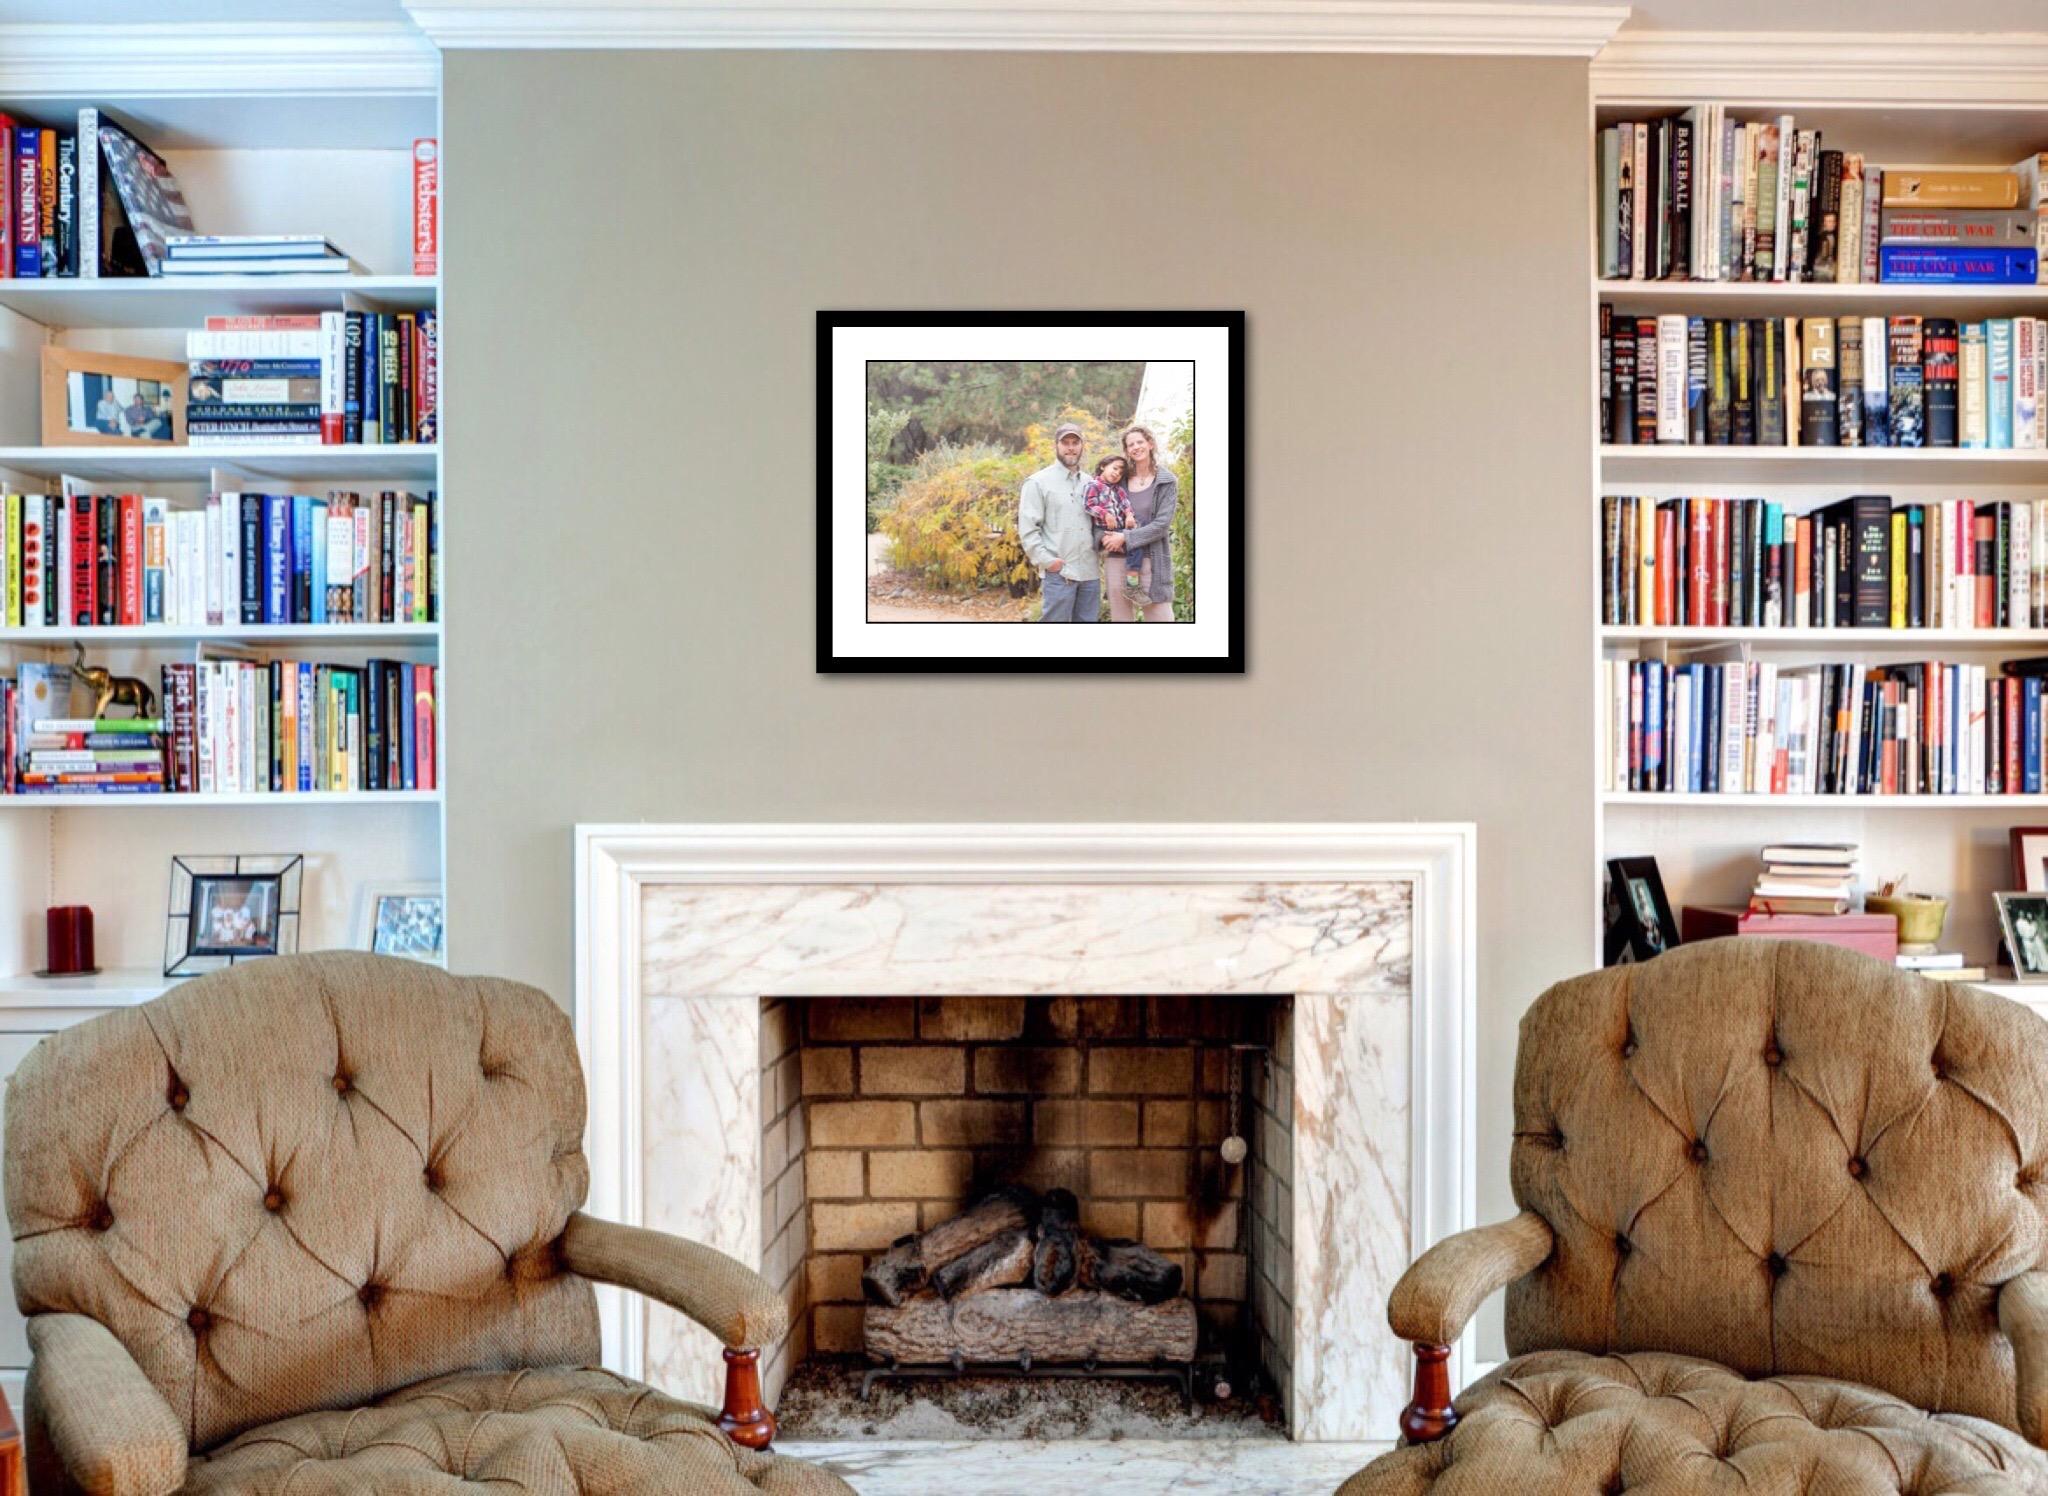 client images custom artwork over fireplace | Placerville-Children-Photographer